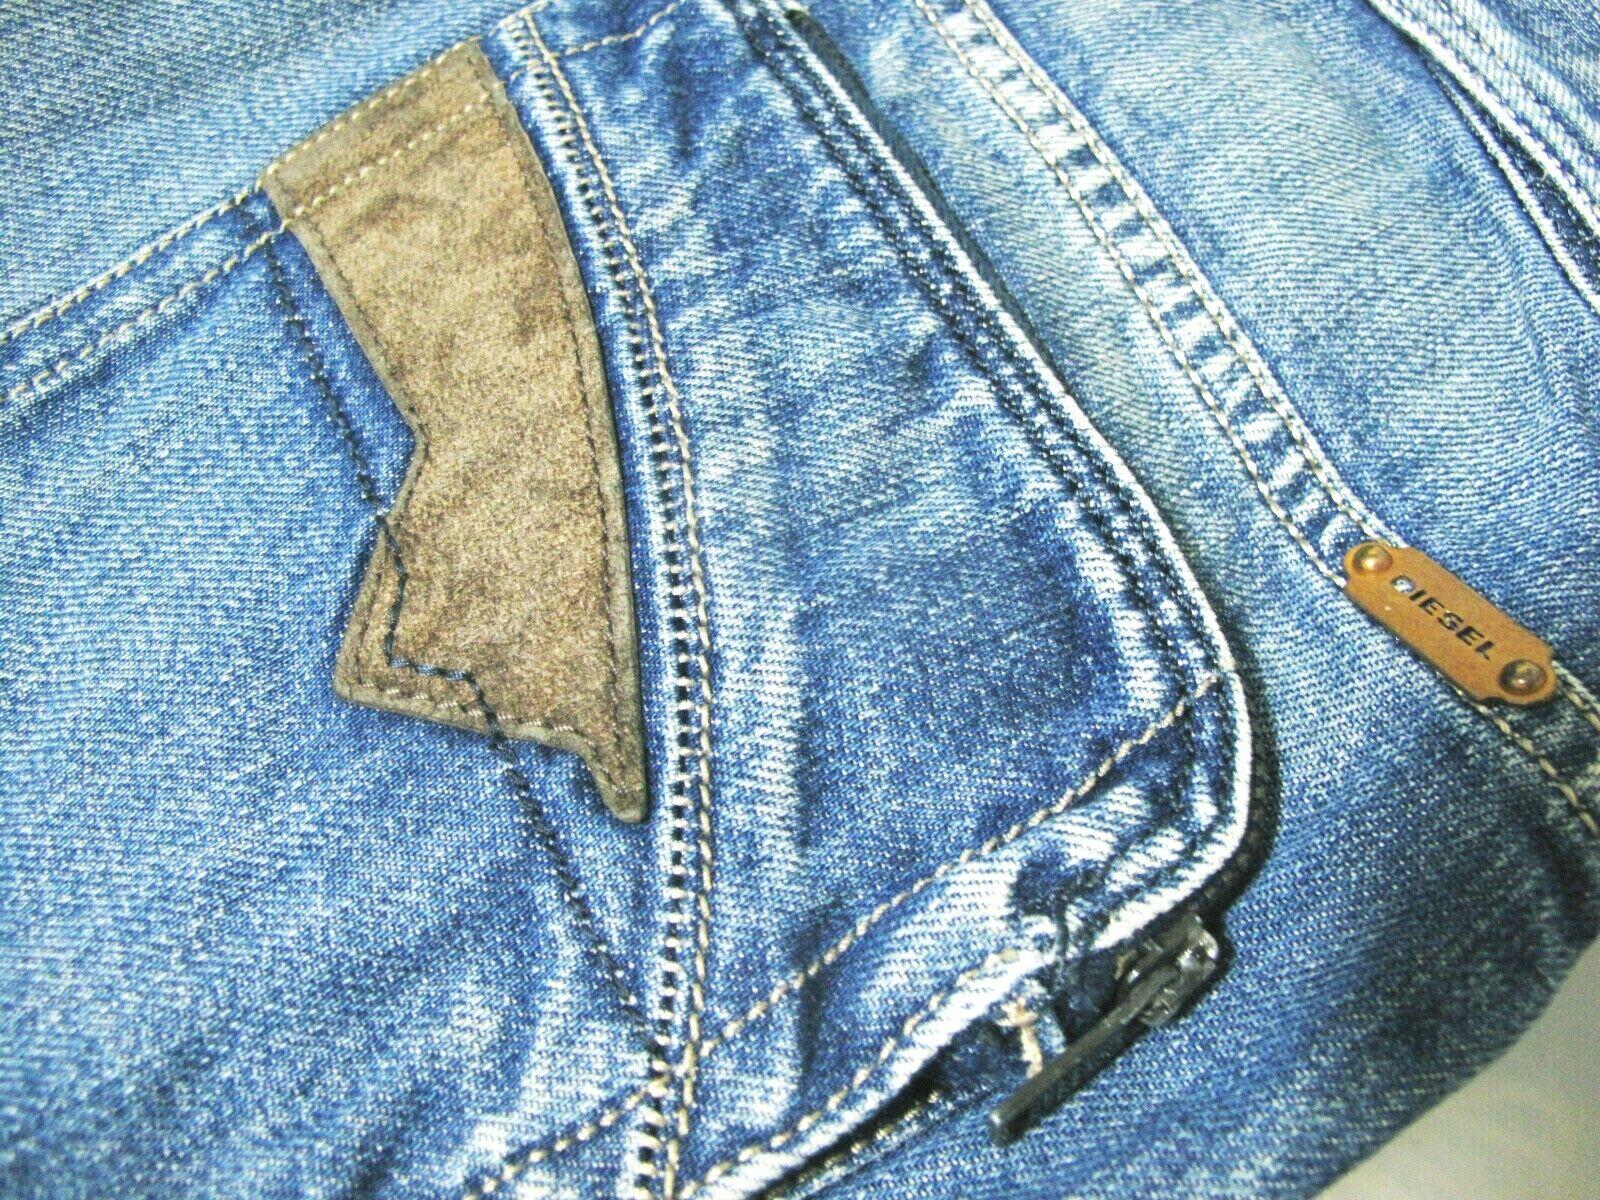 9b5fdce5 AUTHENTIC Men's DIESEL @ POIAK 8XR Regular Slim TAPERED Denim 30 x 29 HOT  Jeans nzyspu2663-Jeans